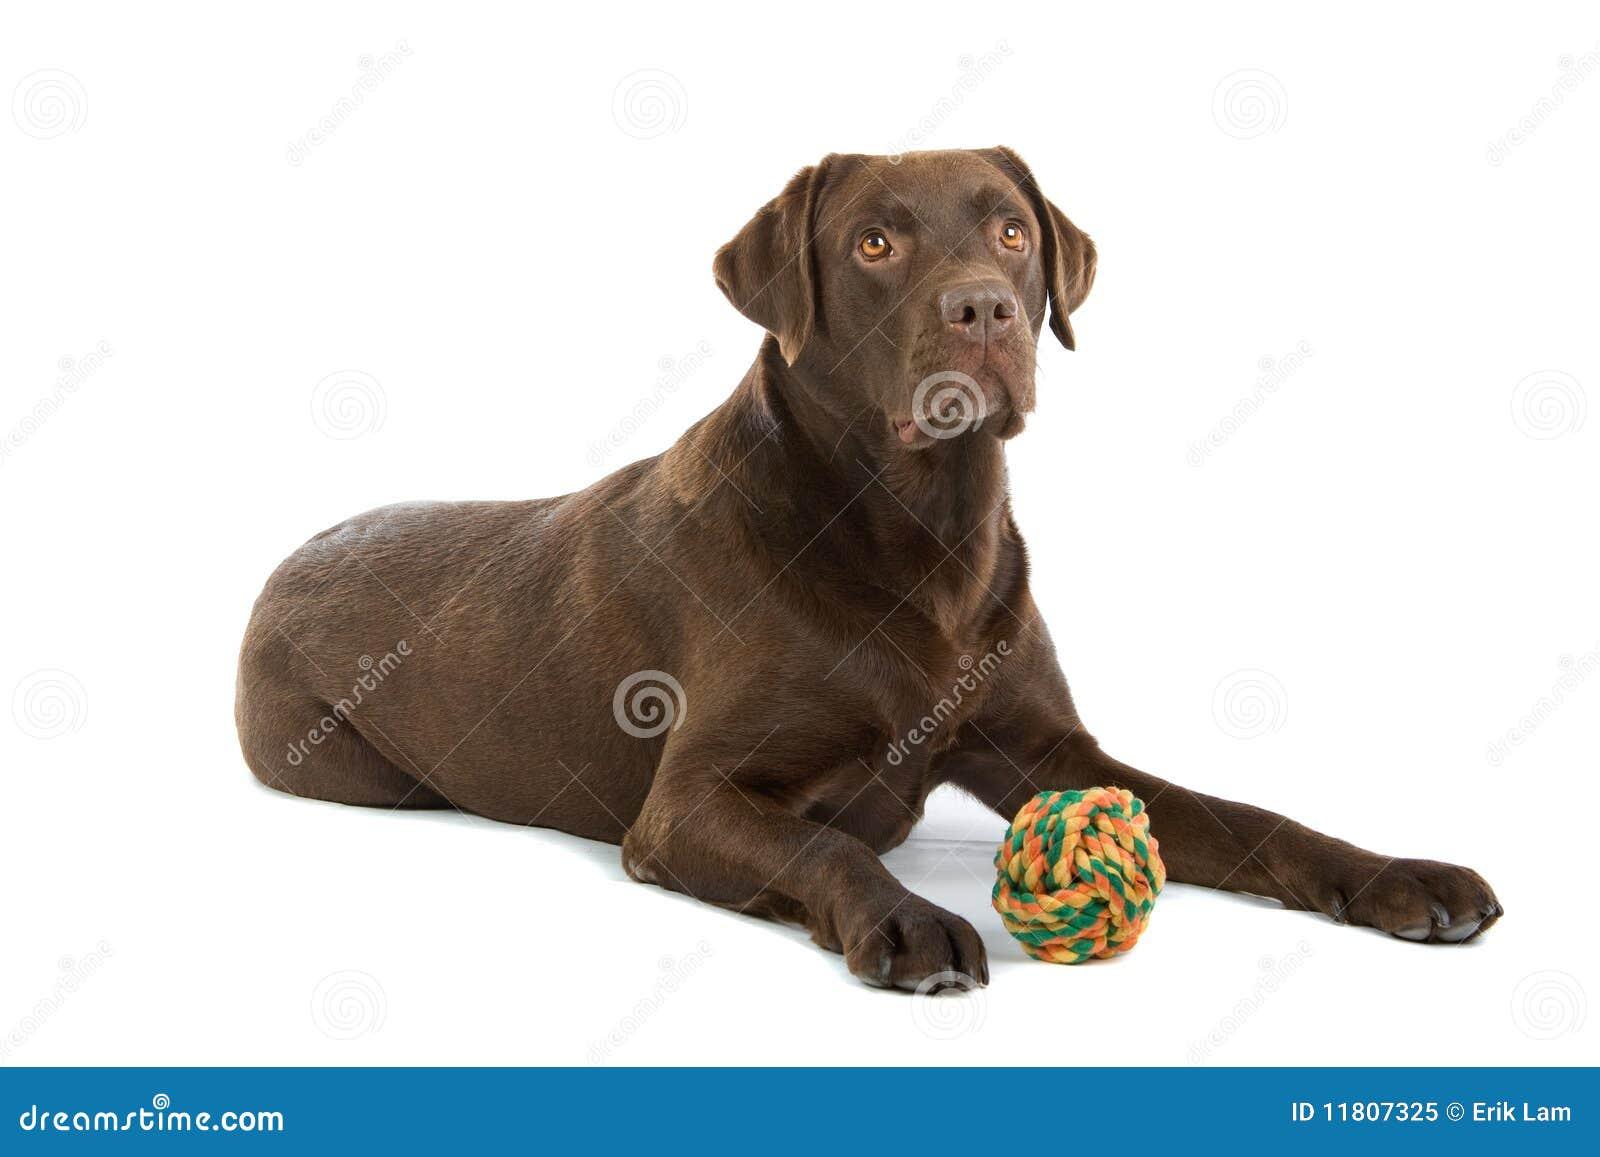 Chocolate Labrador Dog Royalty Free Stock Photo - Image: 11807325